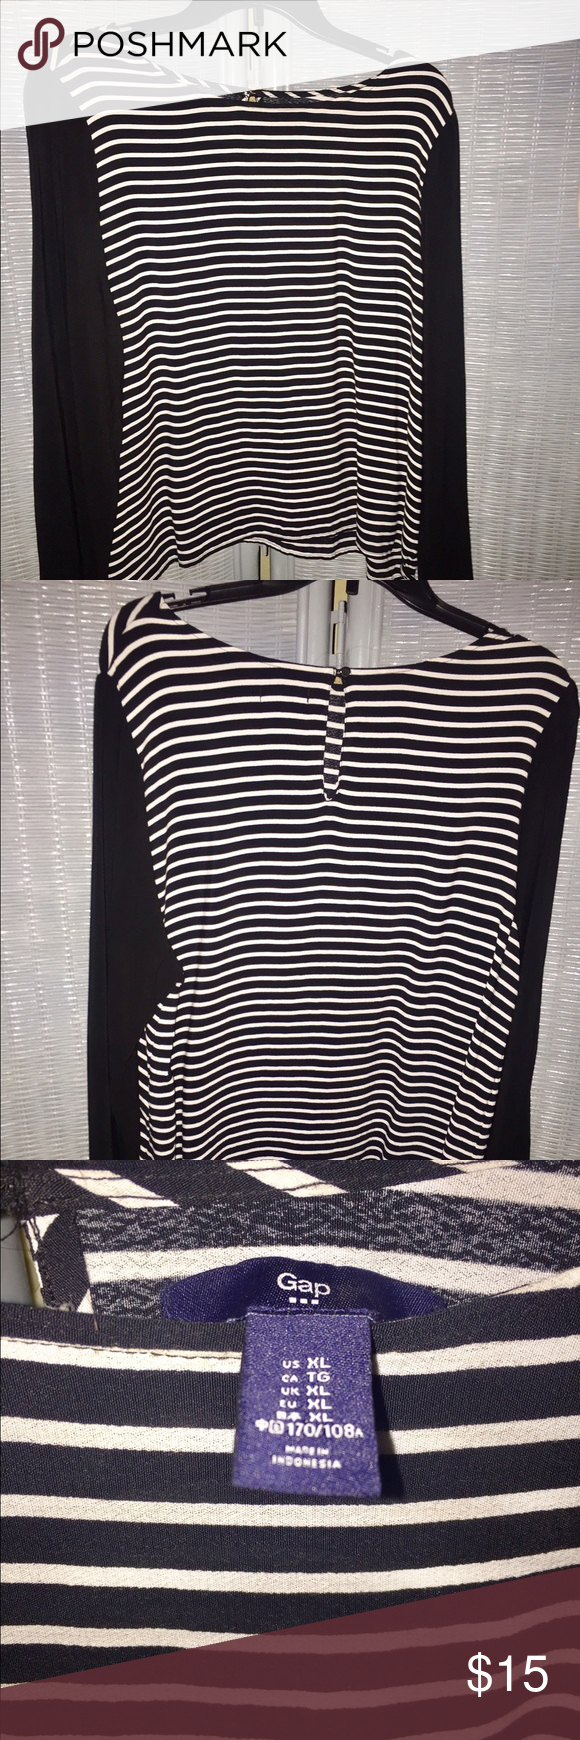 Gap Blouse XL Gap Blouse XL Striped Black & White. Please my other listings , mix match bundle and save ! GAP Tops Blouses